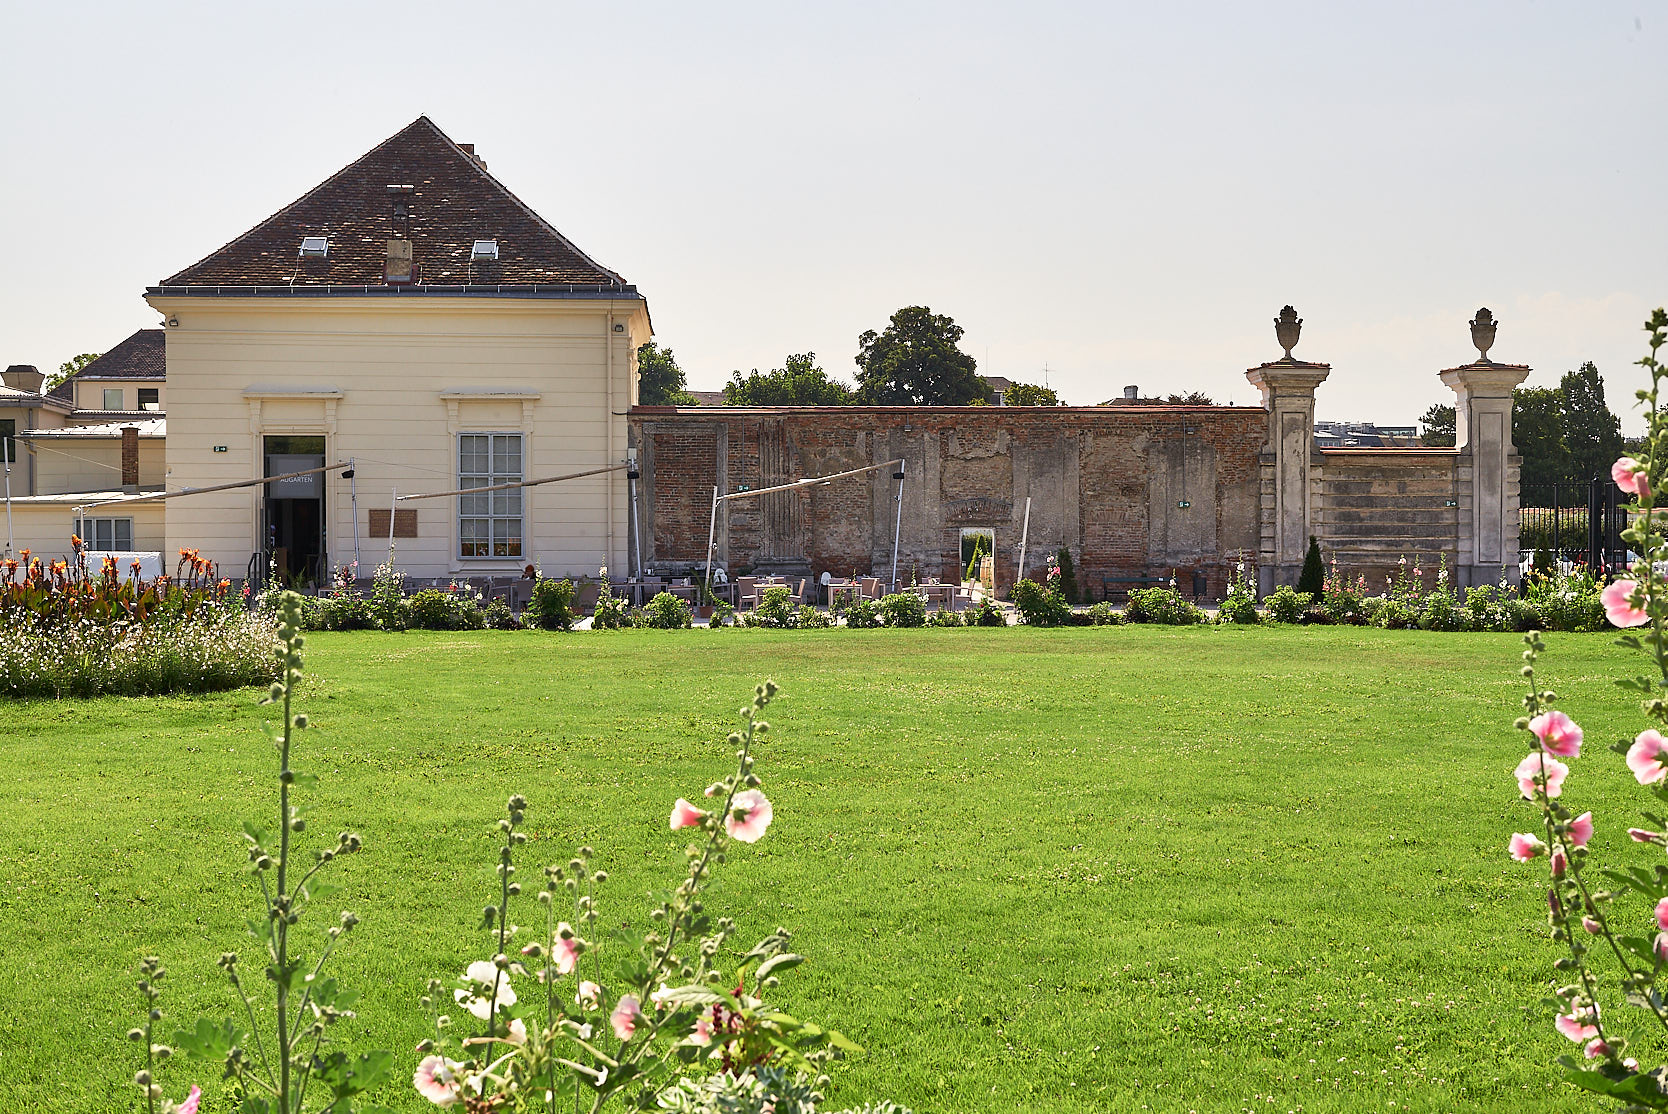 Saalgebäude Augarten: View from the Augarten